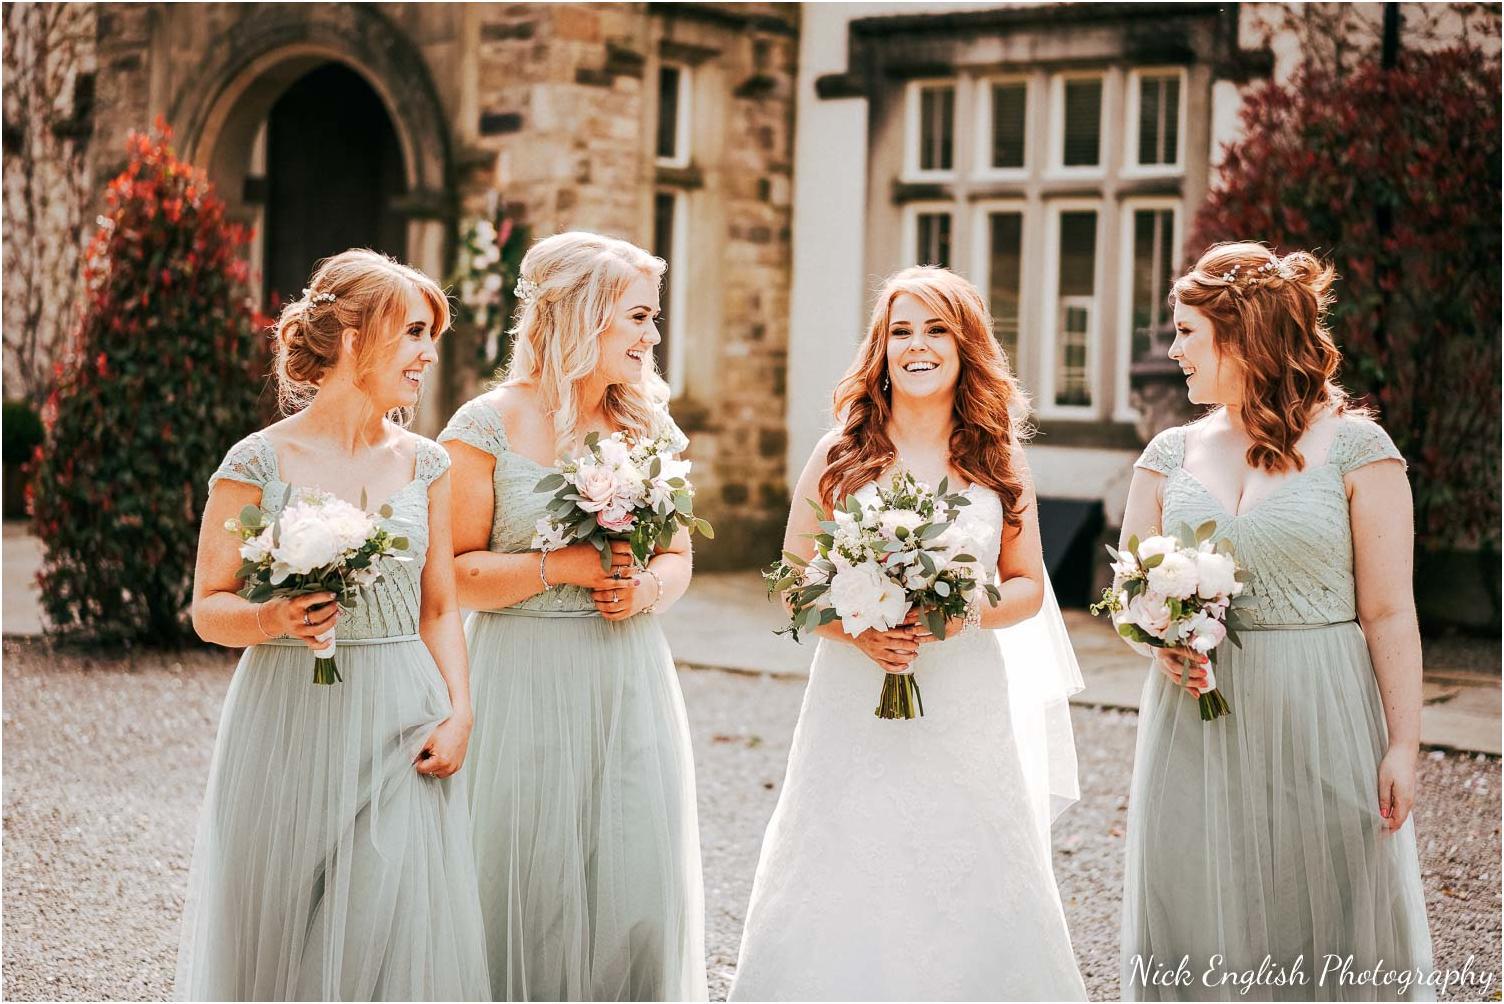 Mitton_Hall_Wedding_Photographer-124.jpg